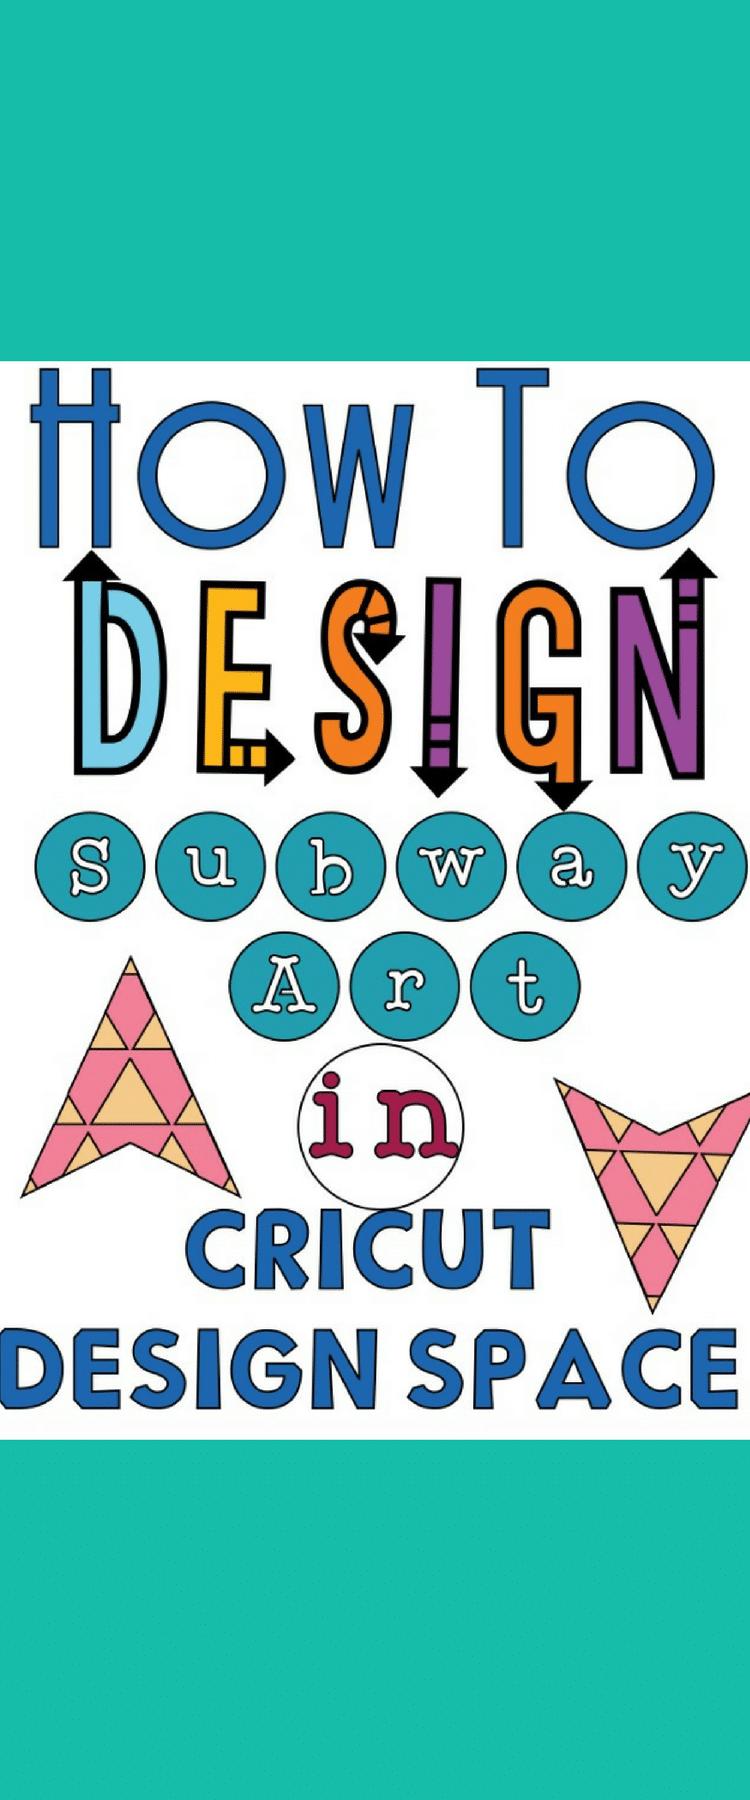 Subway Art / Cricut Design Space / Cricut Tutorial / Cricut Tips / Cricut Subway Art via @clarkscondensed